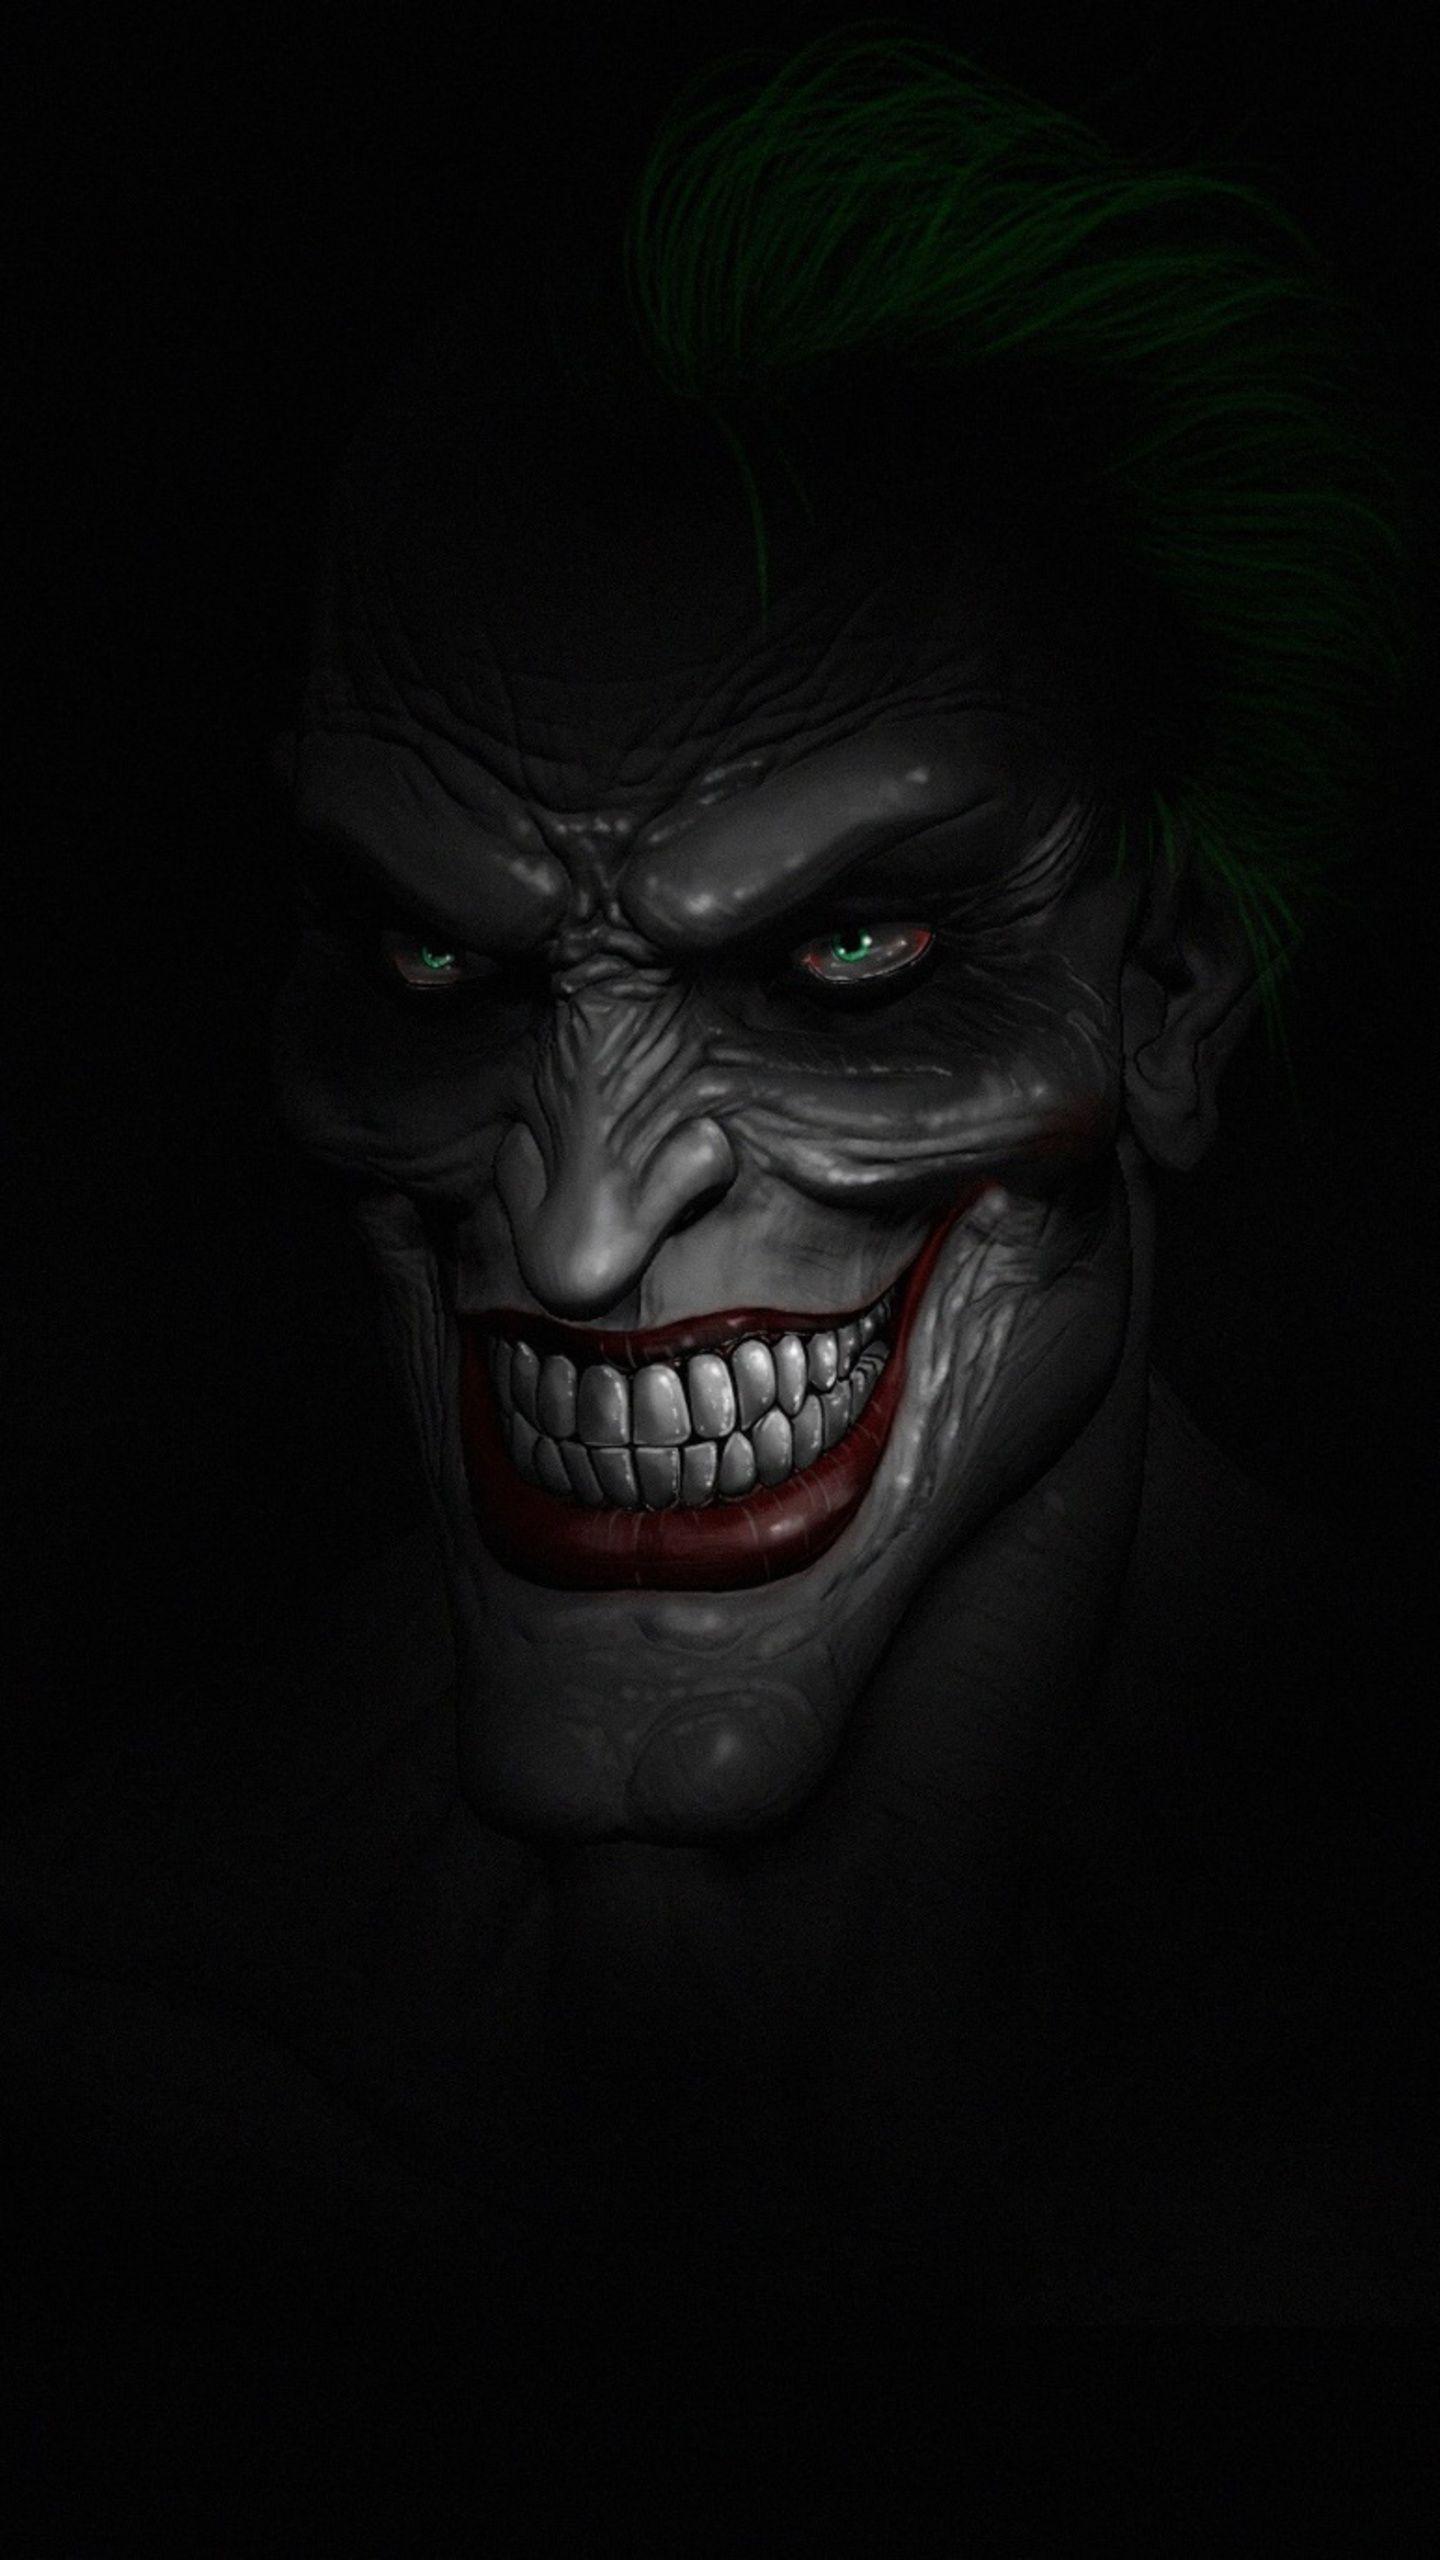 Top Joker Quotes Of All Time By Heath Ledger Batman The Dark Knight Joker Makeup Heathledge Joker Wallpapers Joker Hd Wallpaper Batman Joker Wallpaper Dark knight horror joker wallpaper hd